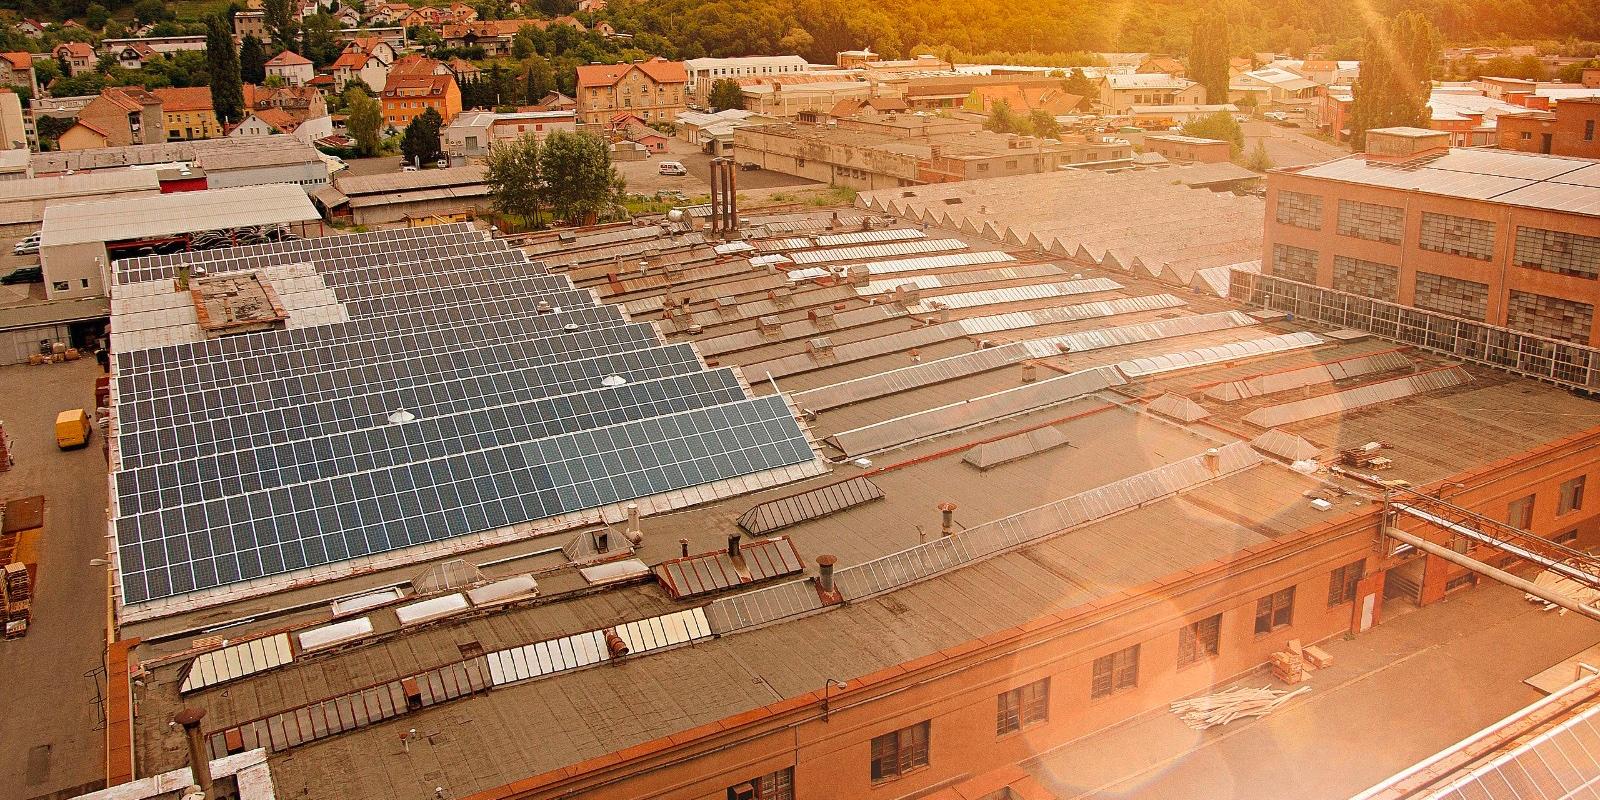 EGEB: Australia to hit 50% renewables by 2030, Colorado energy shift, bifacial solar, and more